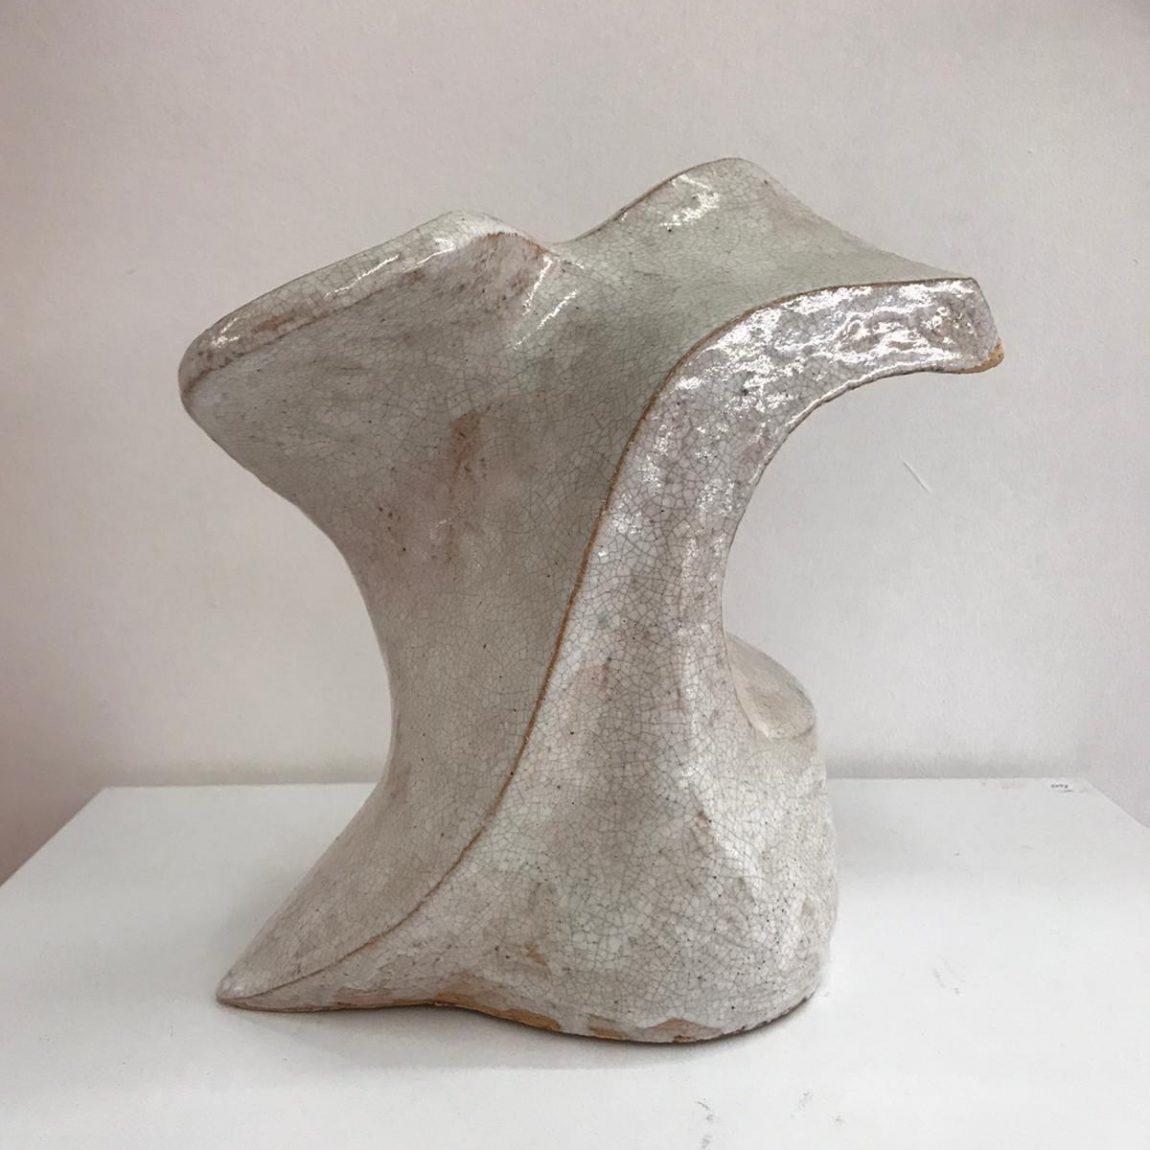 İjlal Marmarisli  Teknik:Seramik - heykel Fiyat: 1.180 TL